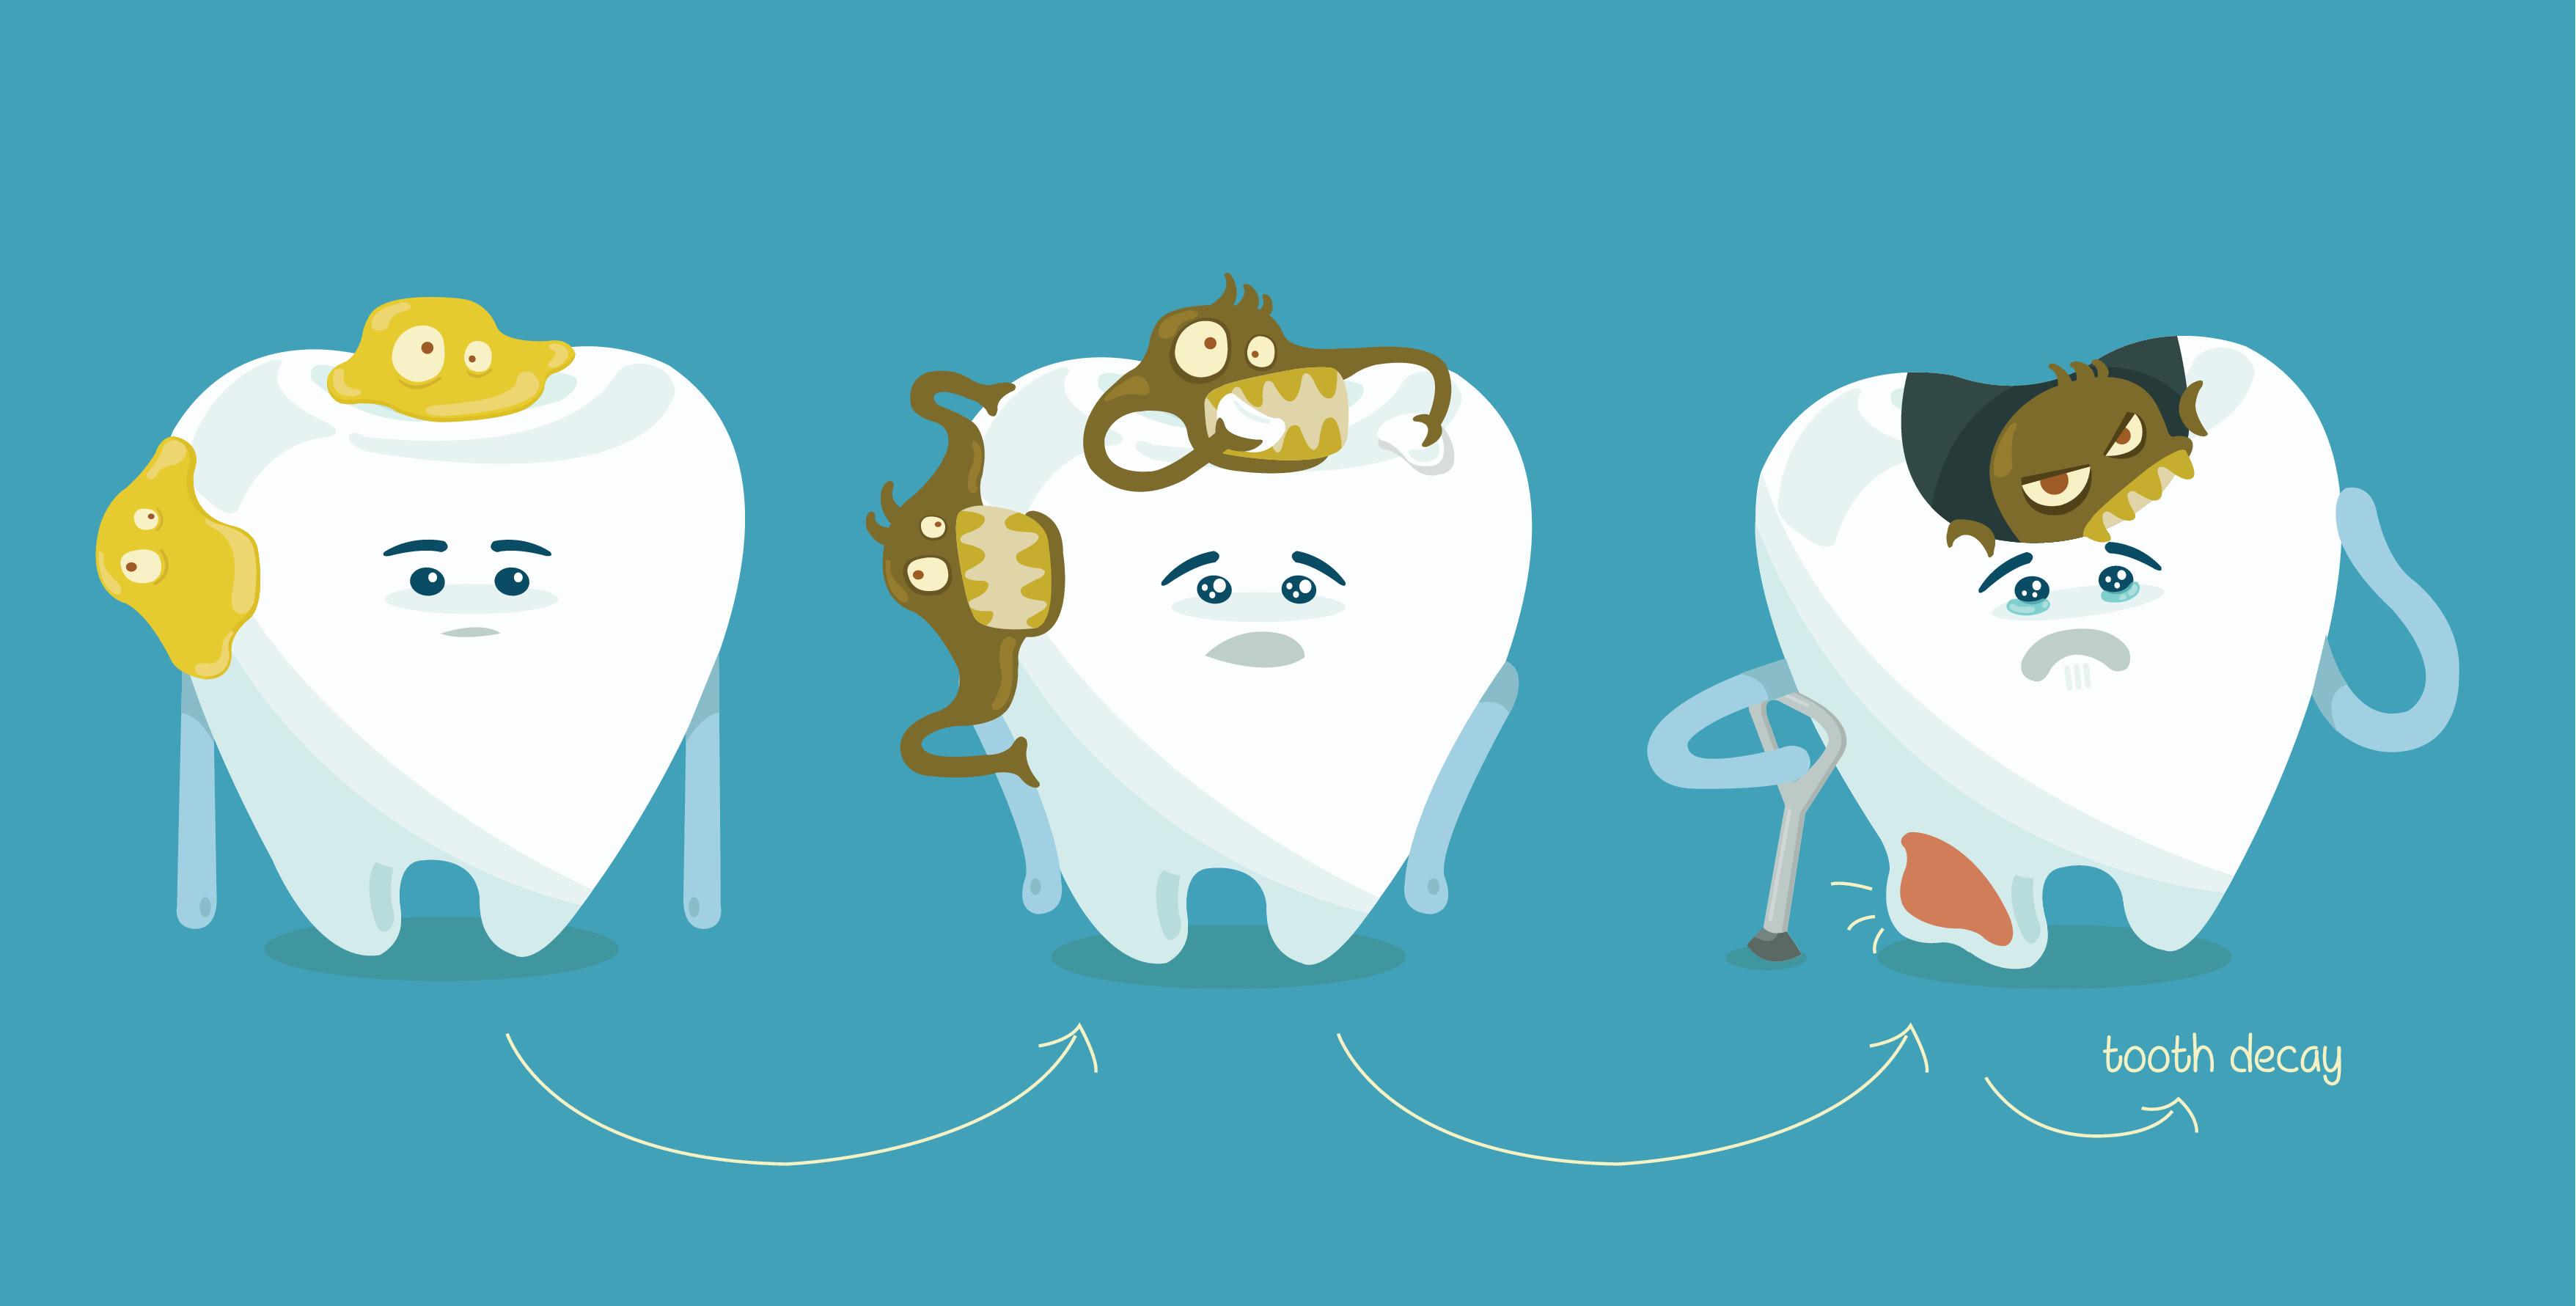 decayed-teeth